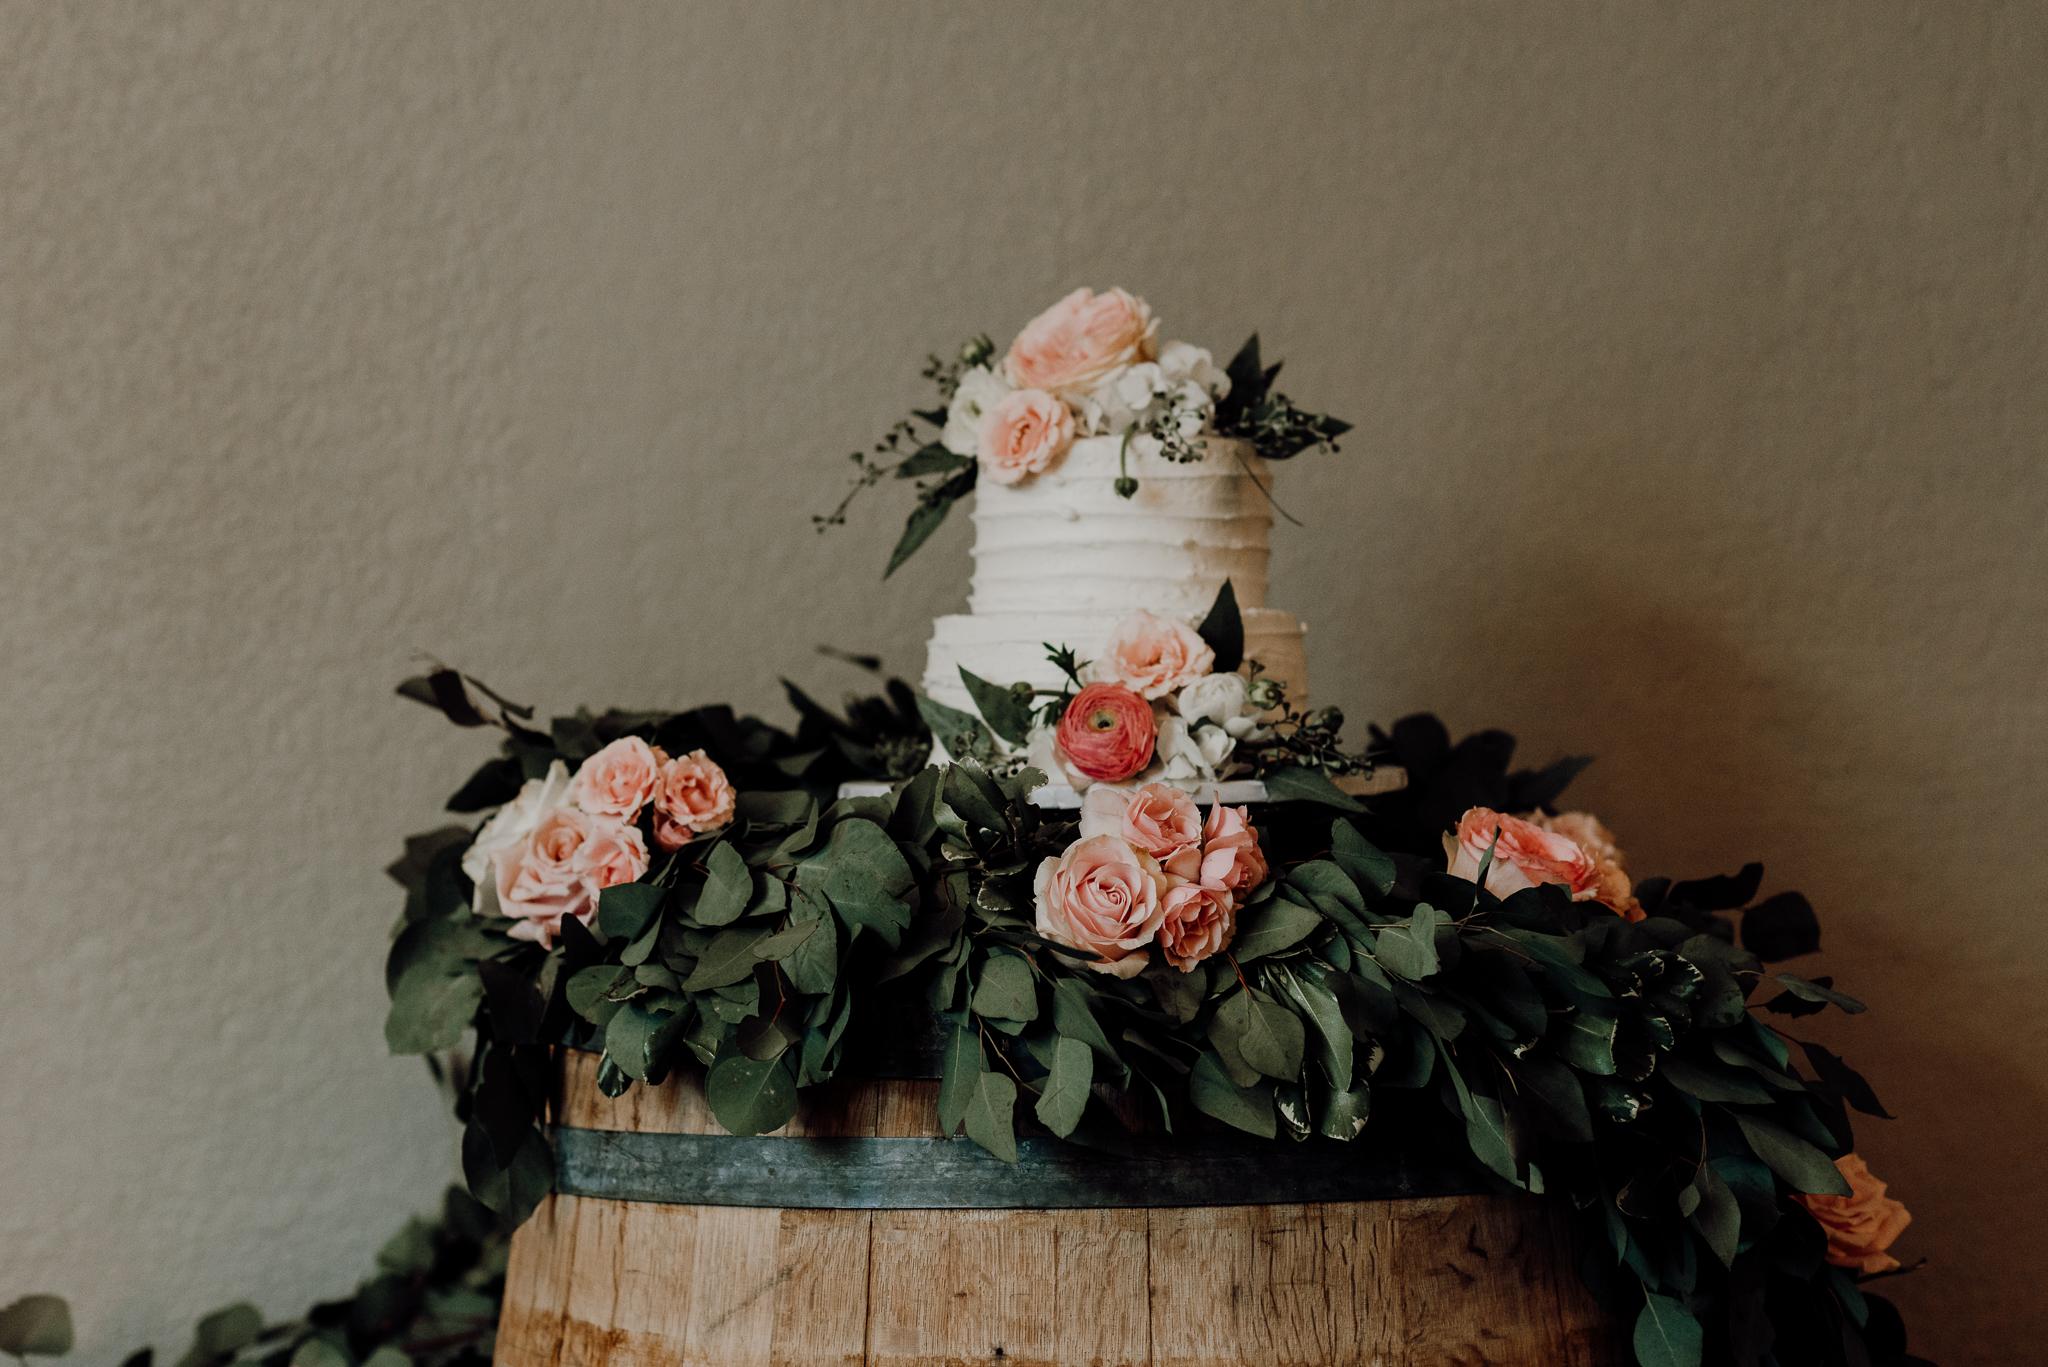 kristen giles photography | texas-wedding-elopement-photographer-Duchman Winery-Austin TX-6-blog.jpg